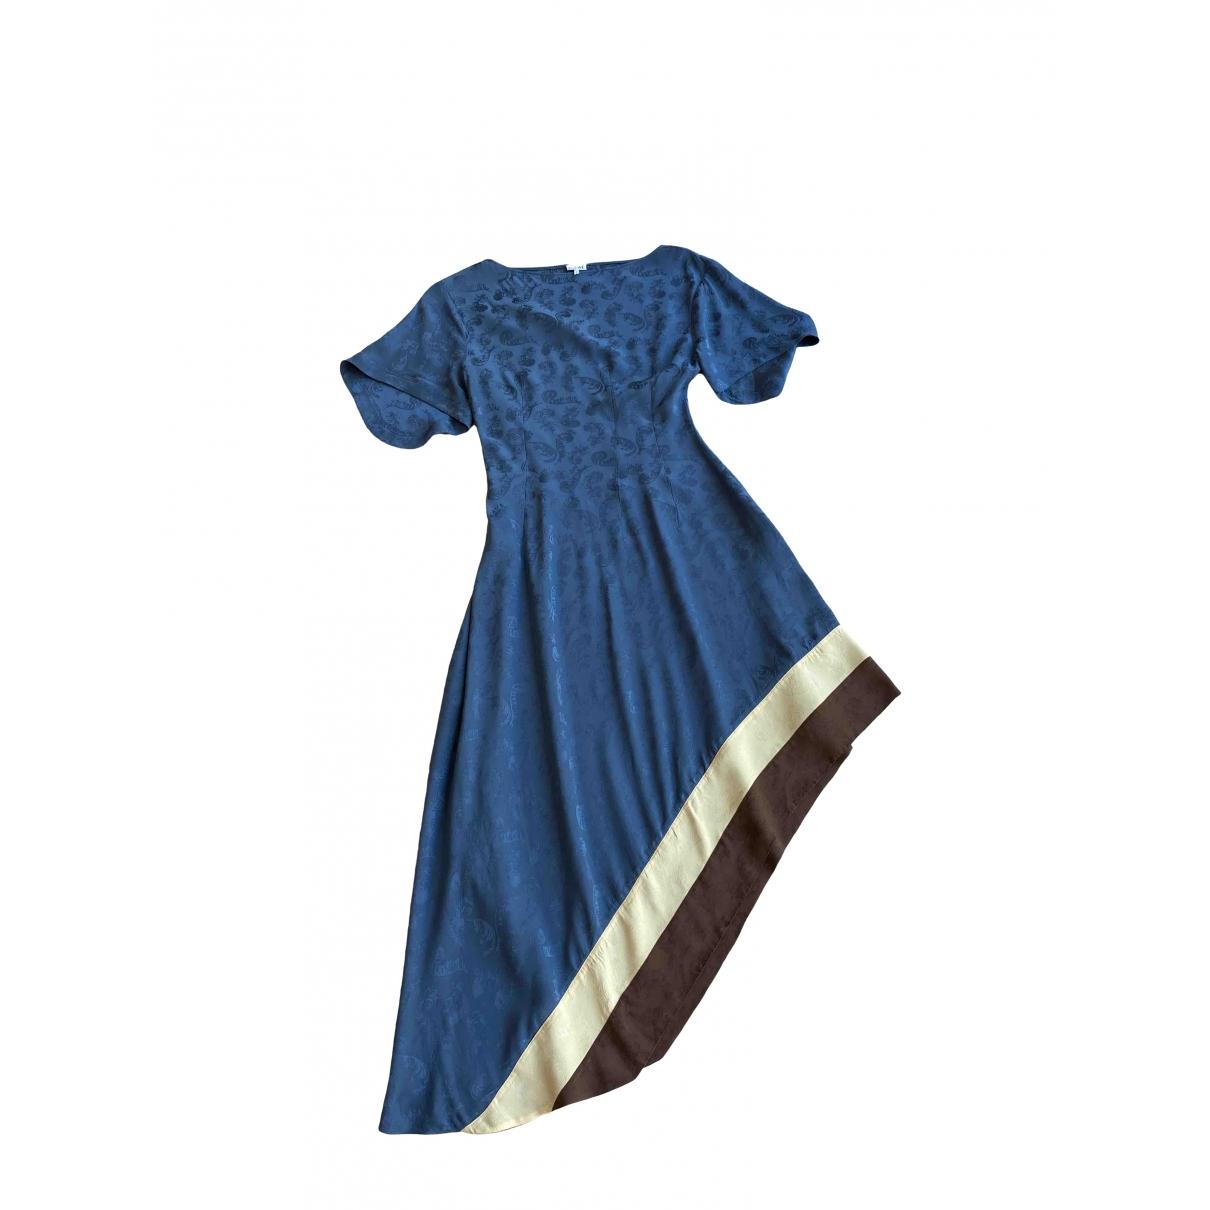 Loewe \N Blue dress for Women 36 FR